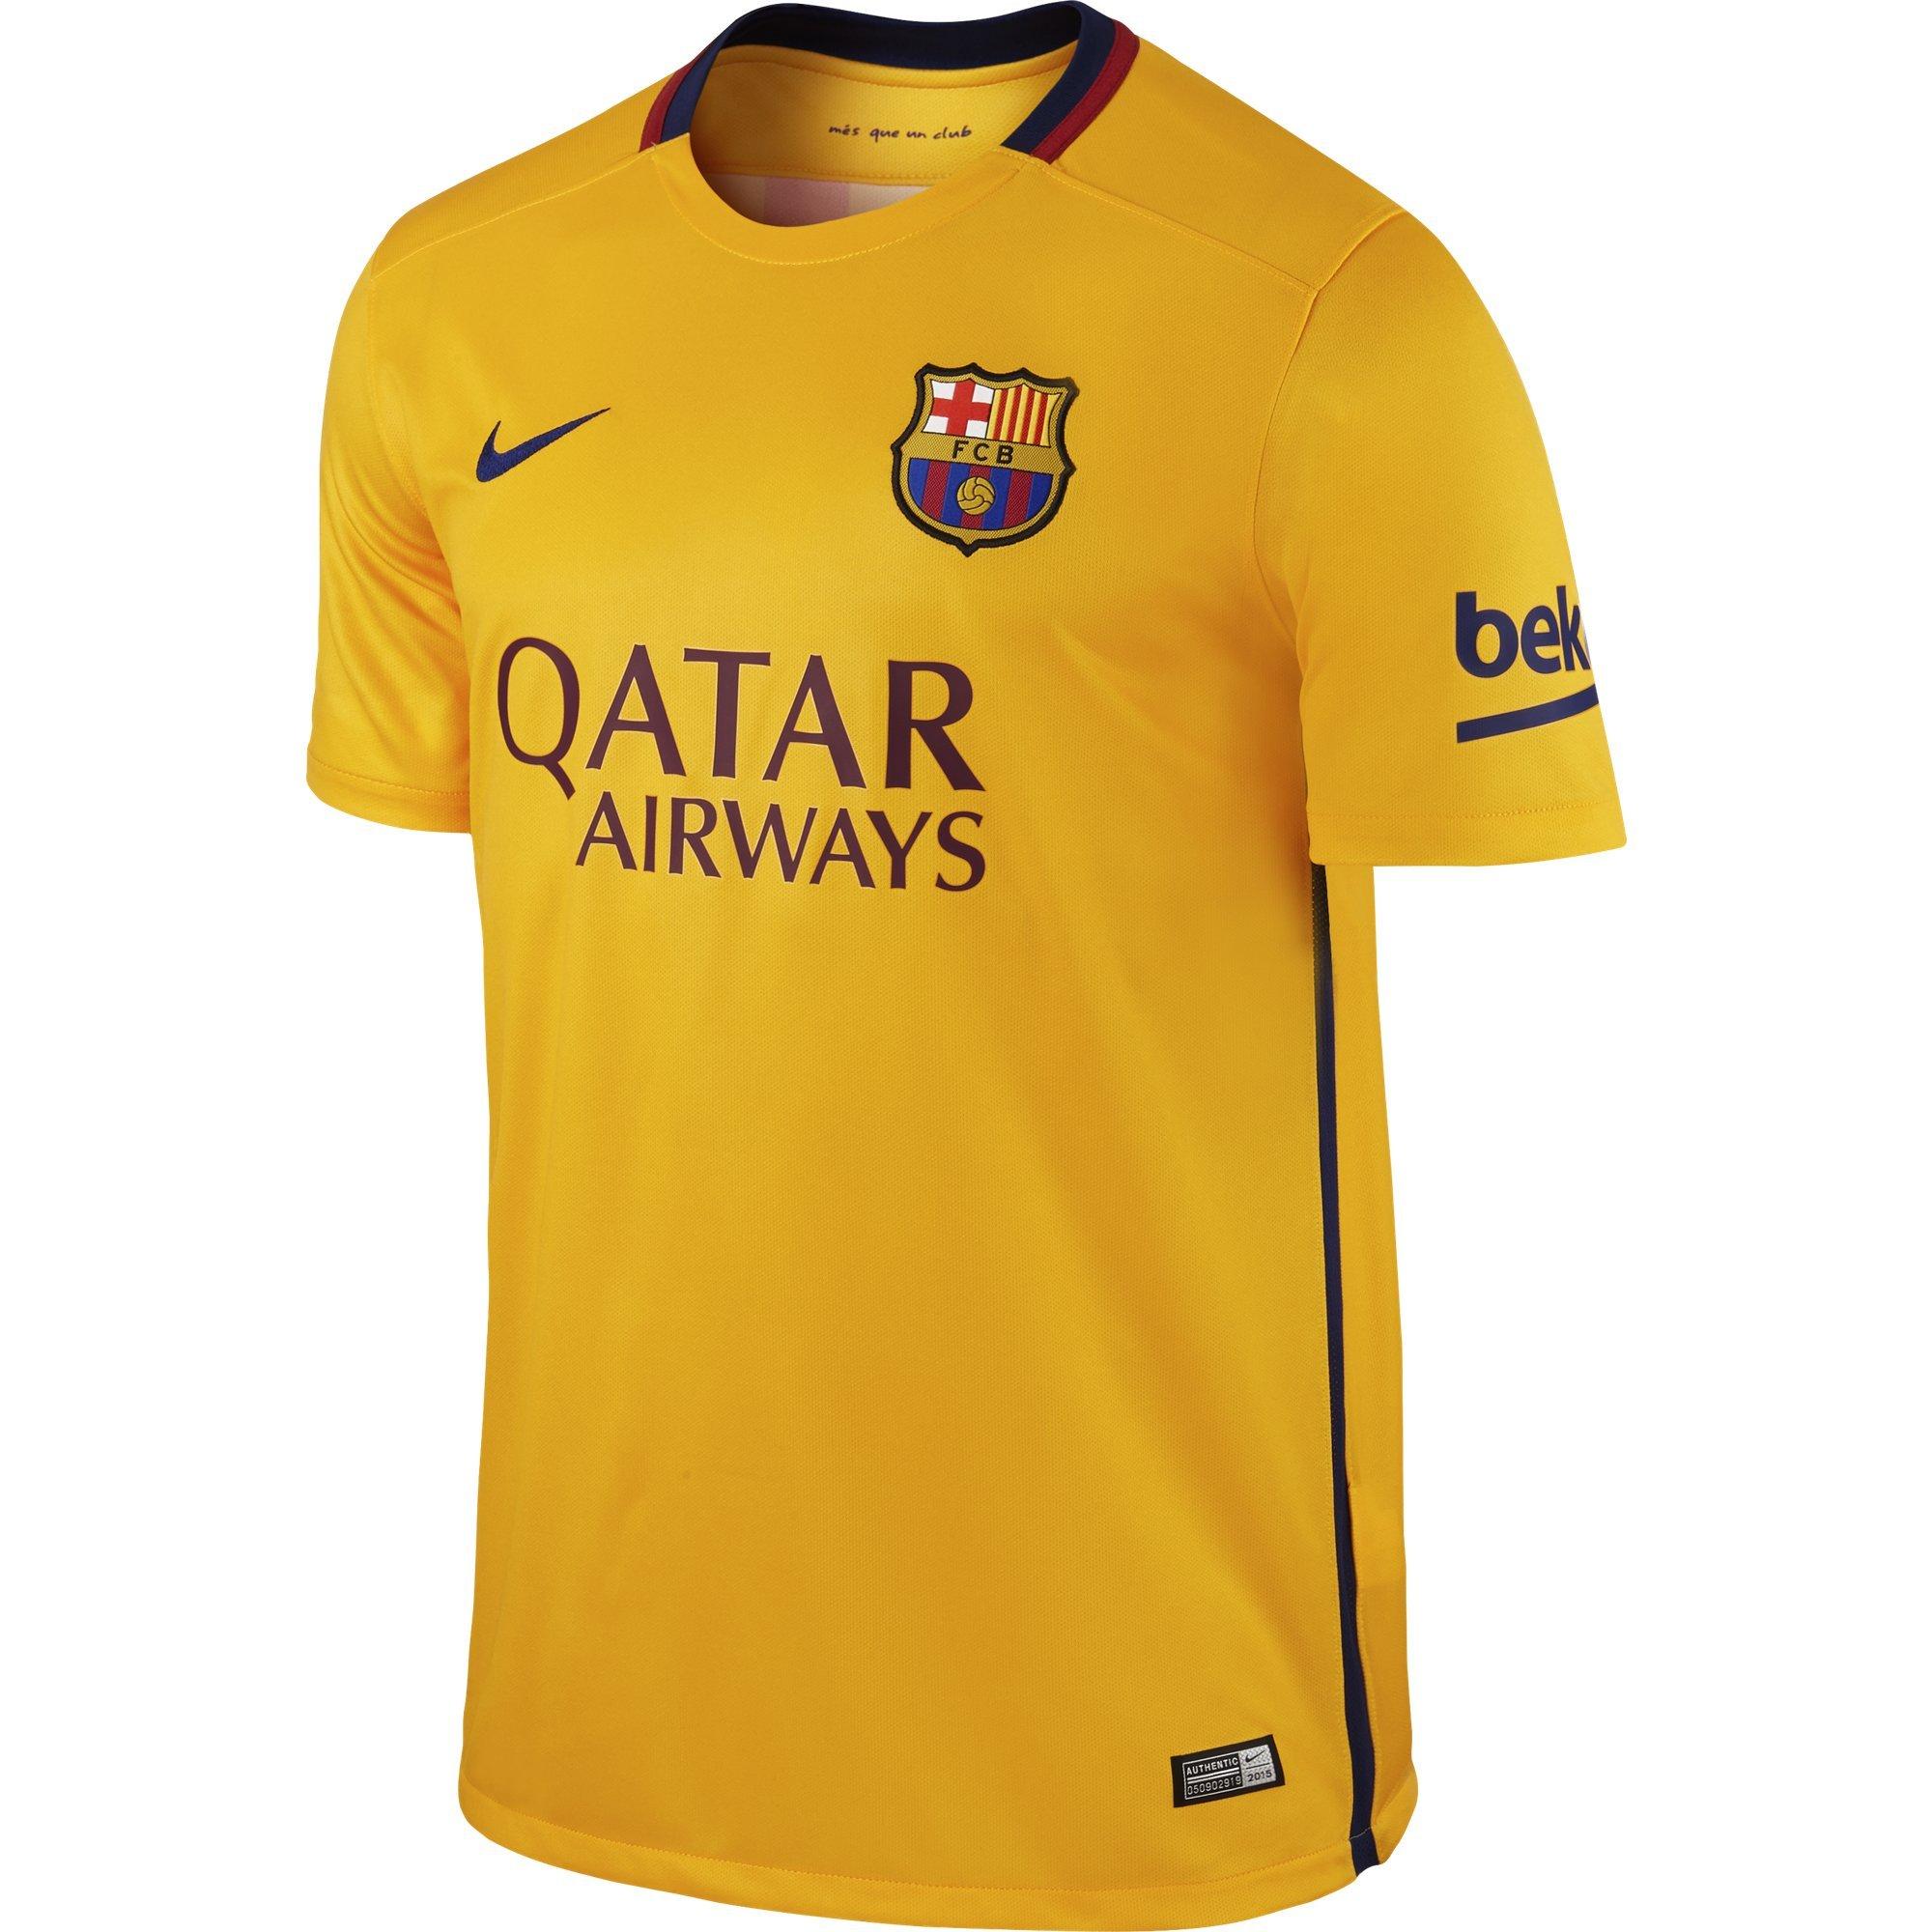 Nike Mens Barcelona Away Stadium Jersey [University Gold]